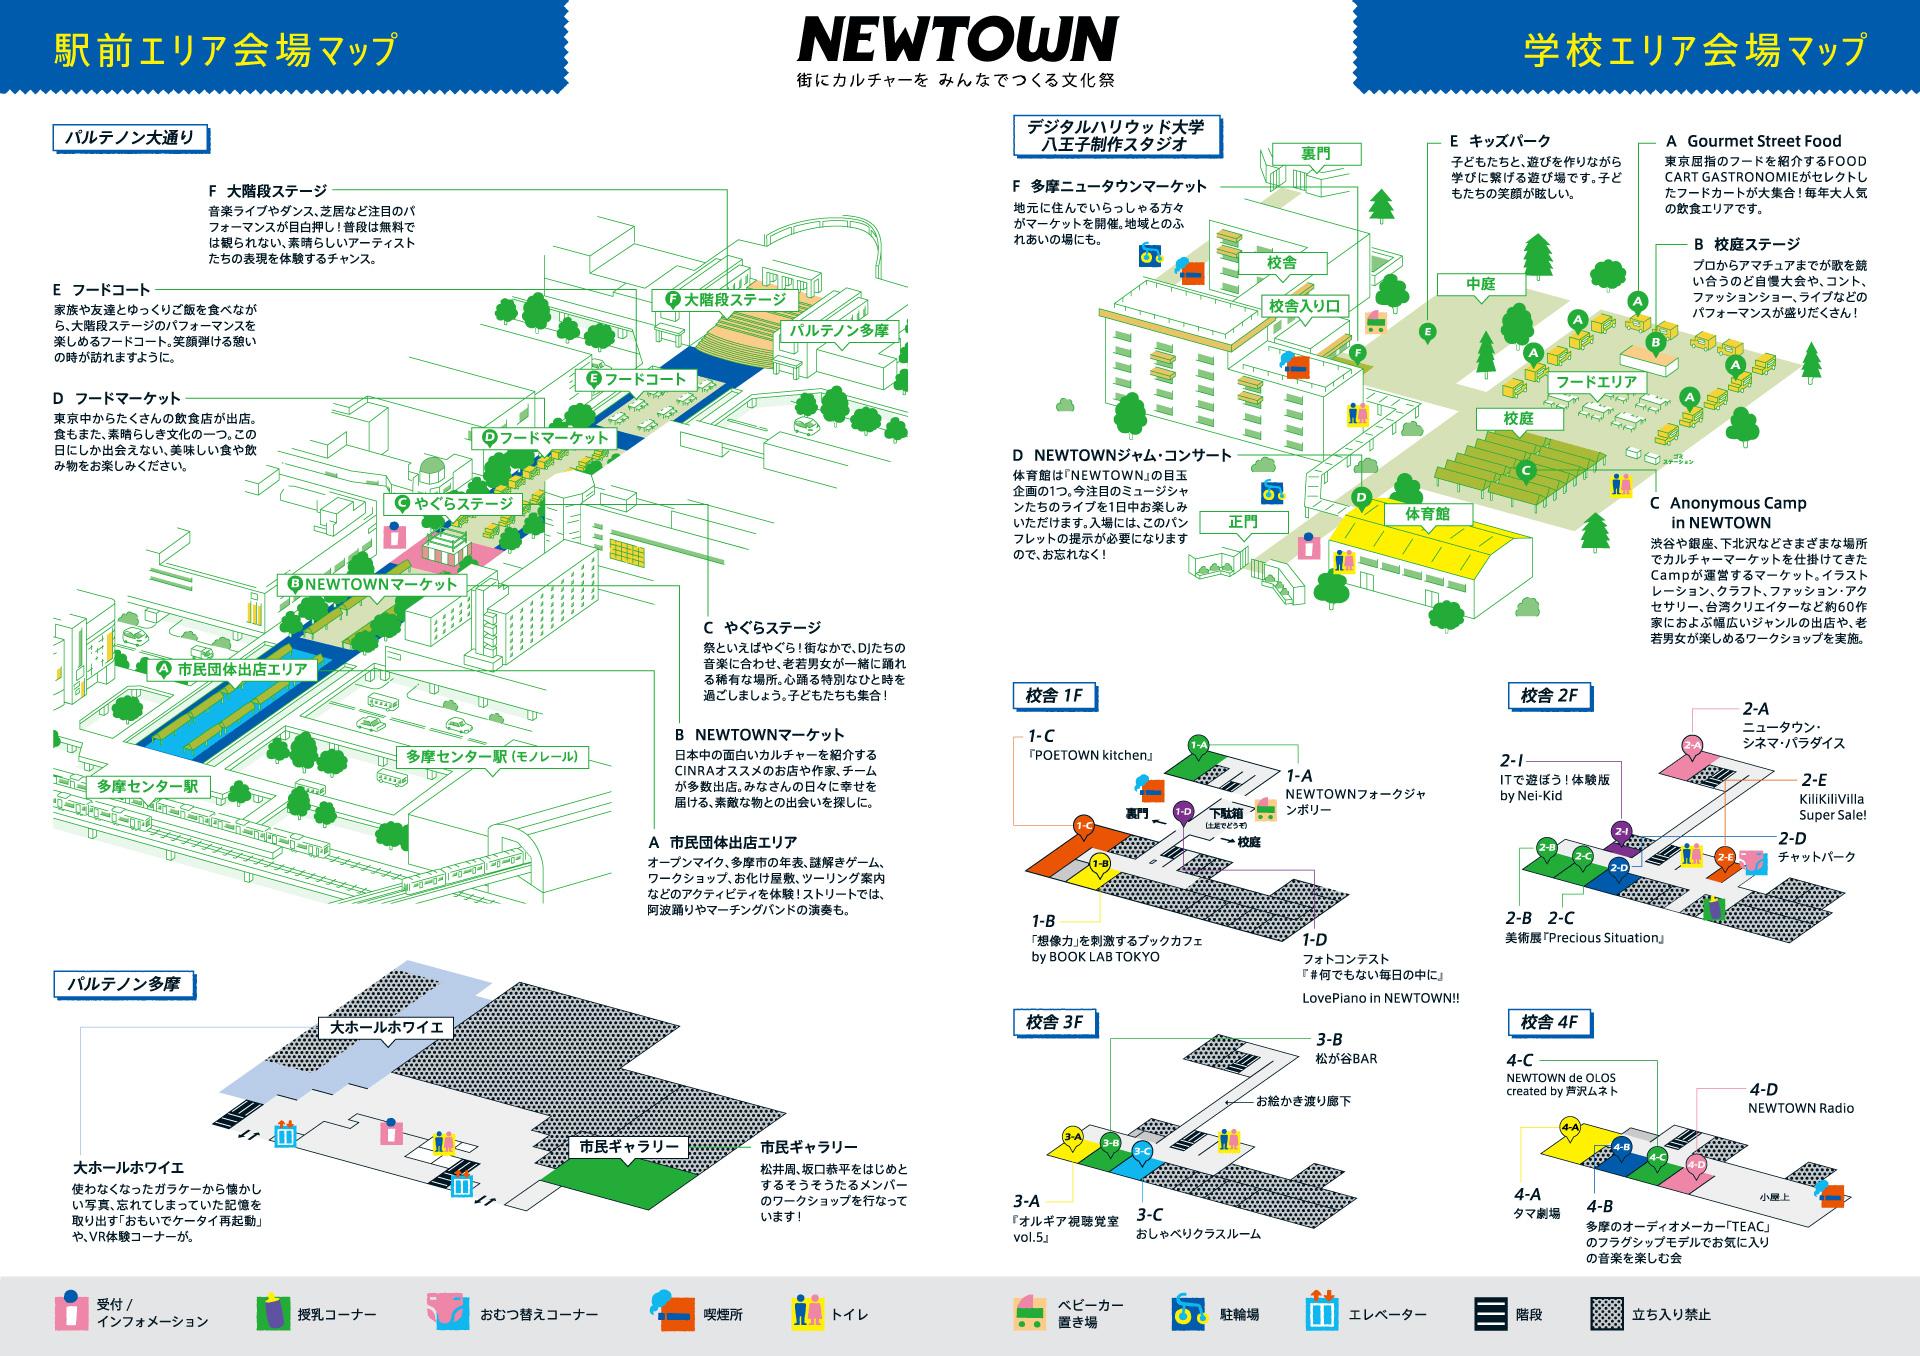 『NEWTOWN 2019』会場マップ